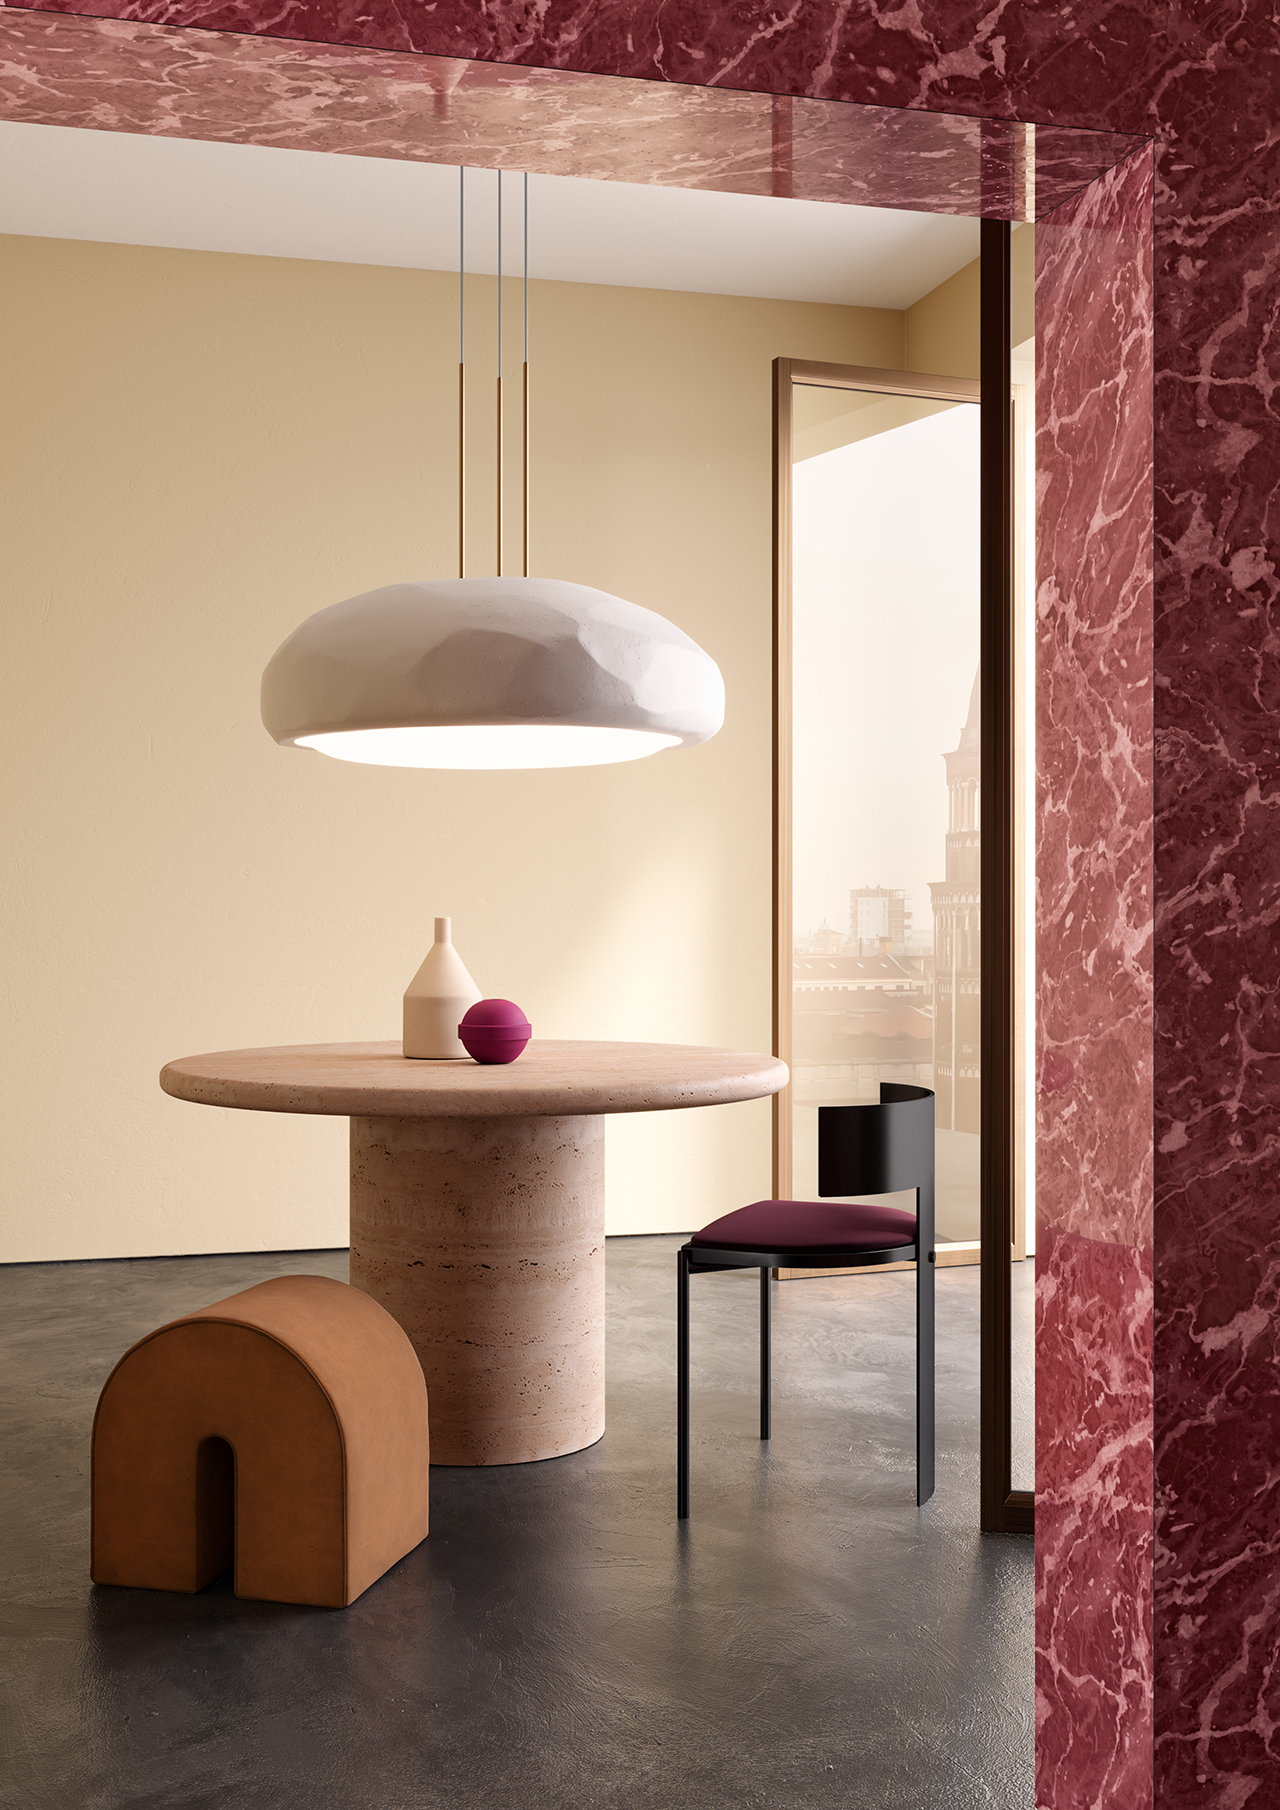 pendant light in living space